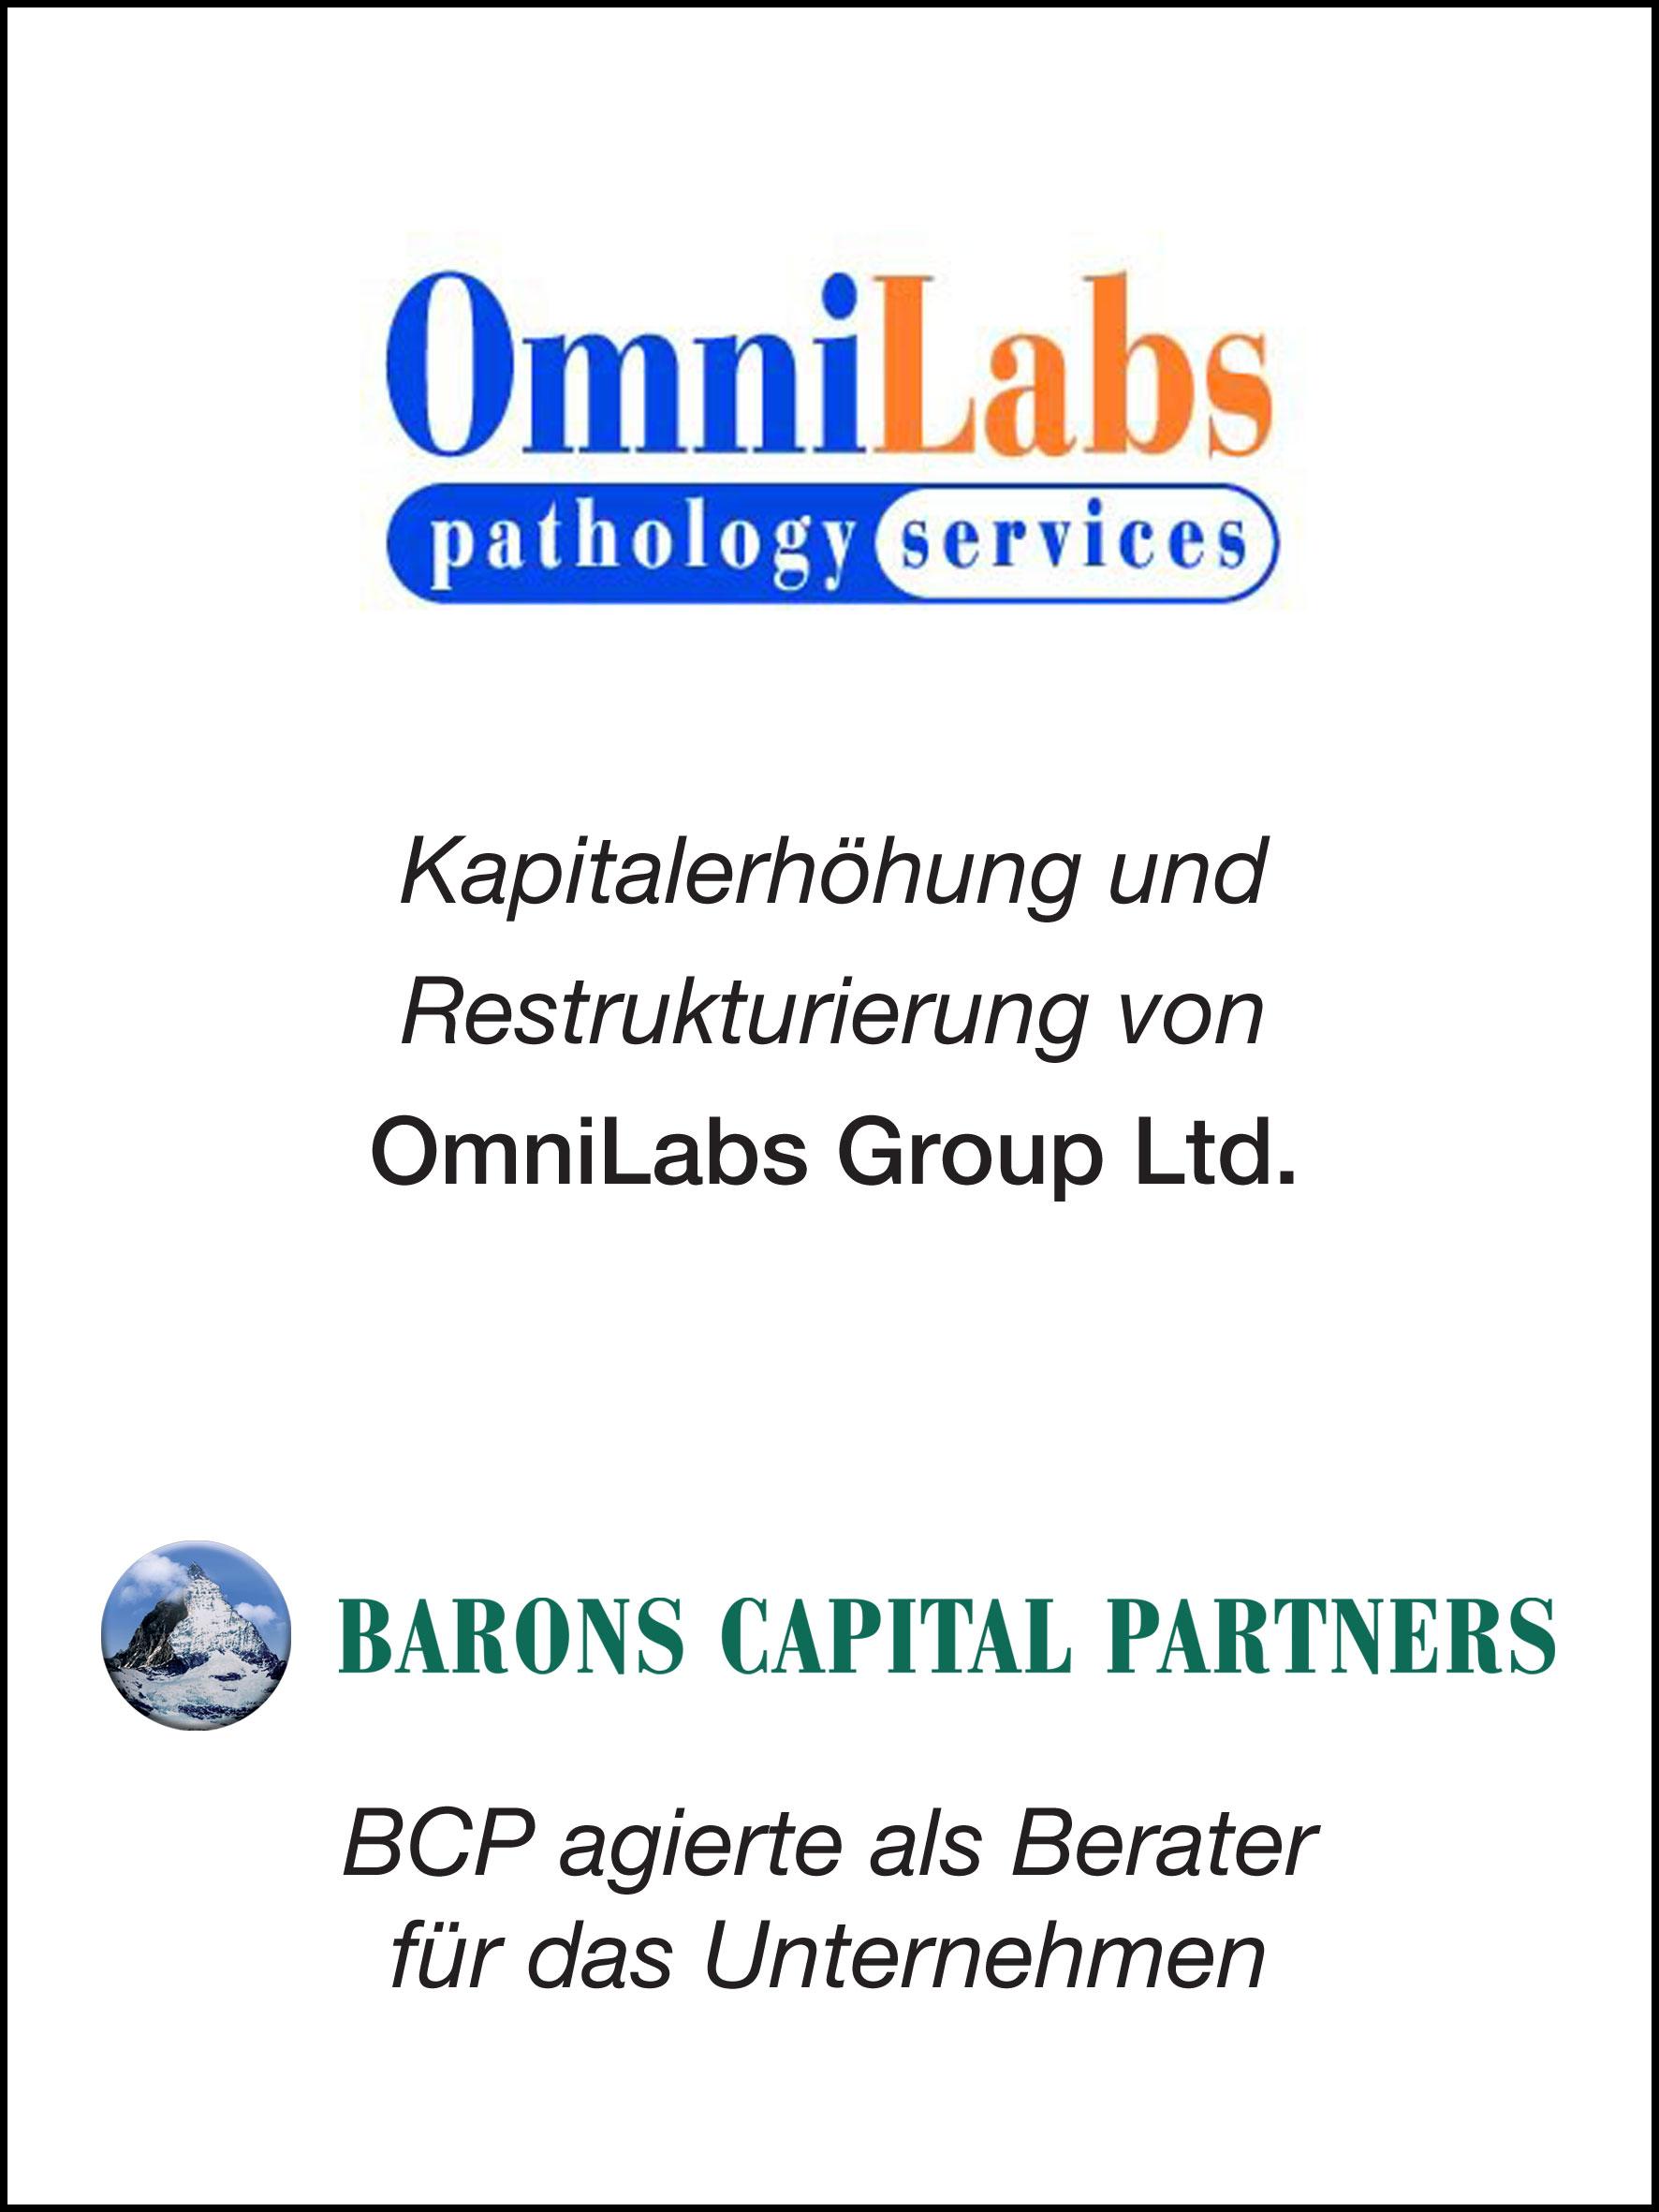 20_OmniLabs Group Ltd_G